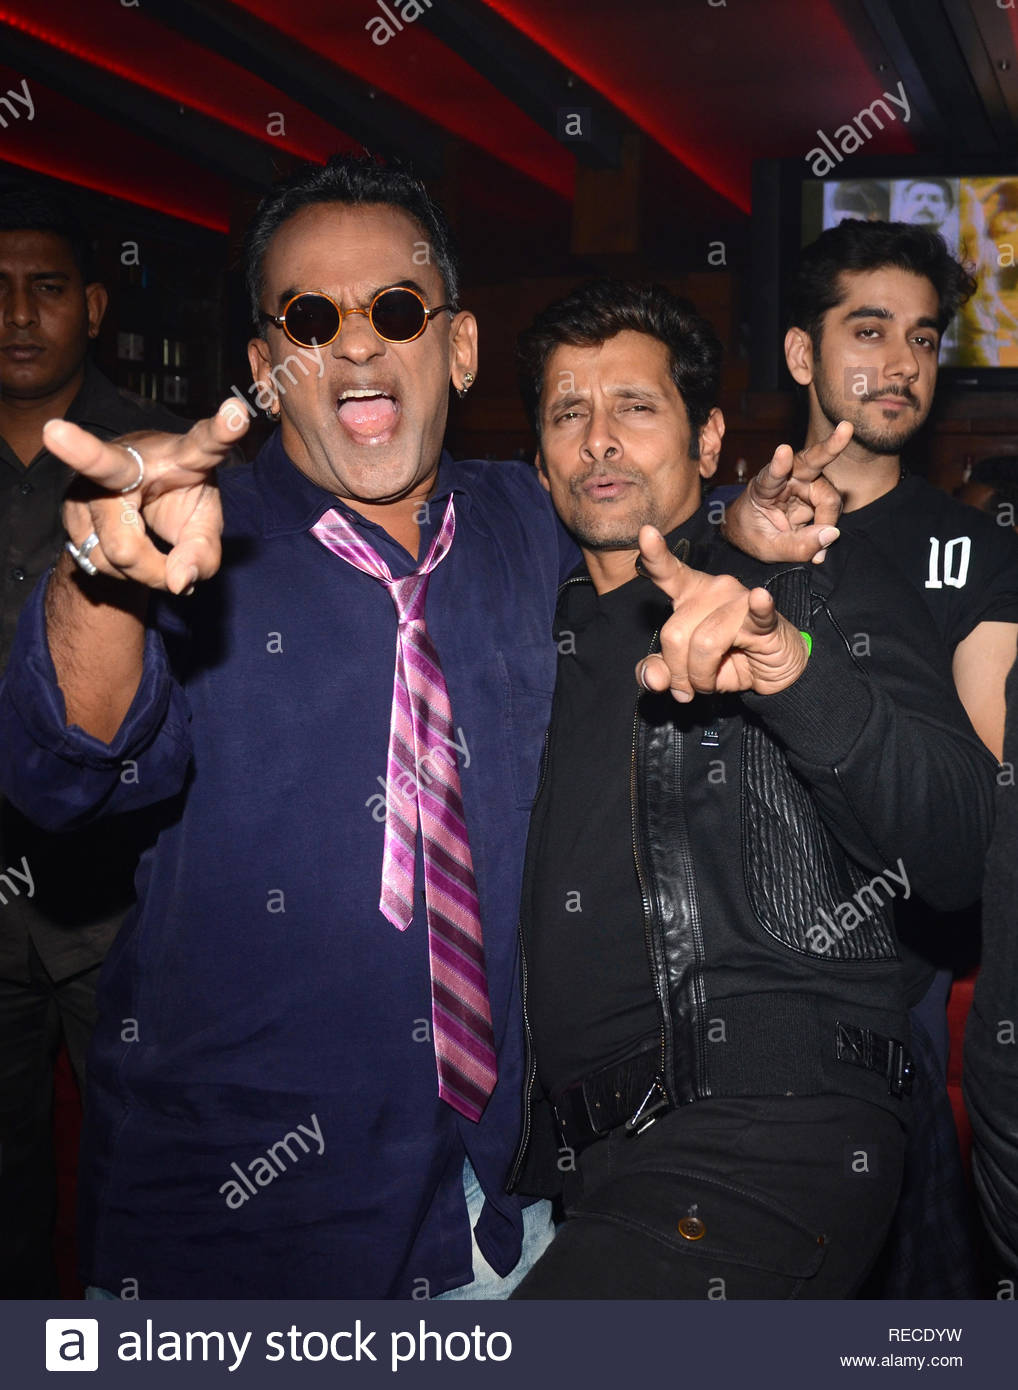 Singer Remo Fernandes, actor Vikram,and Vinay Virmani during the music launch of upcoming film David in Mumbai, India on January 14, 2013. (Shripad Naik/ SOLARIS IMAGES) - Stock Image